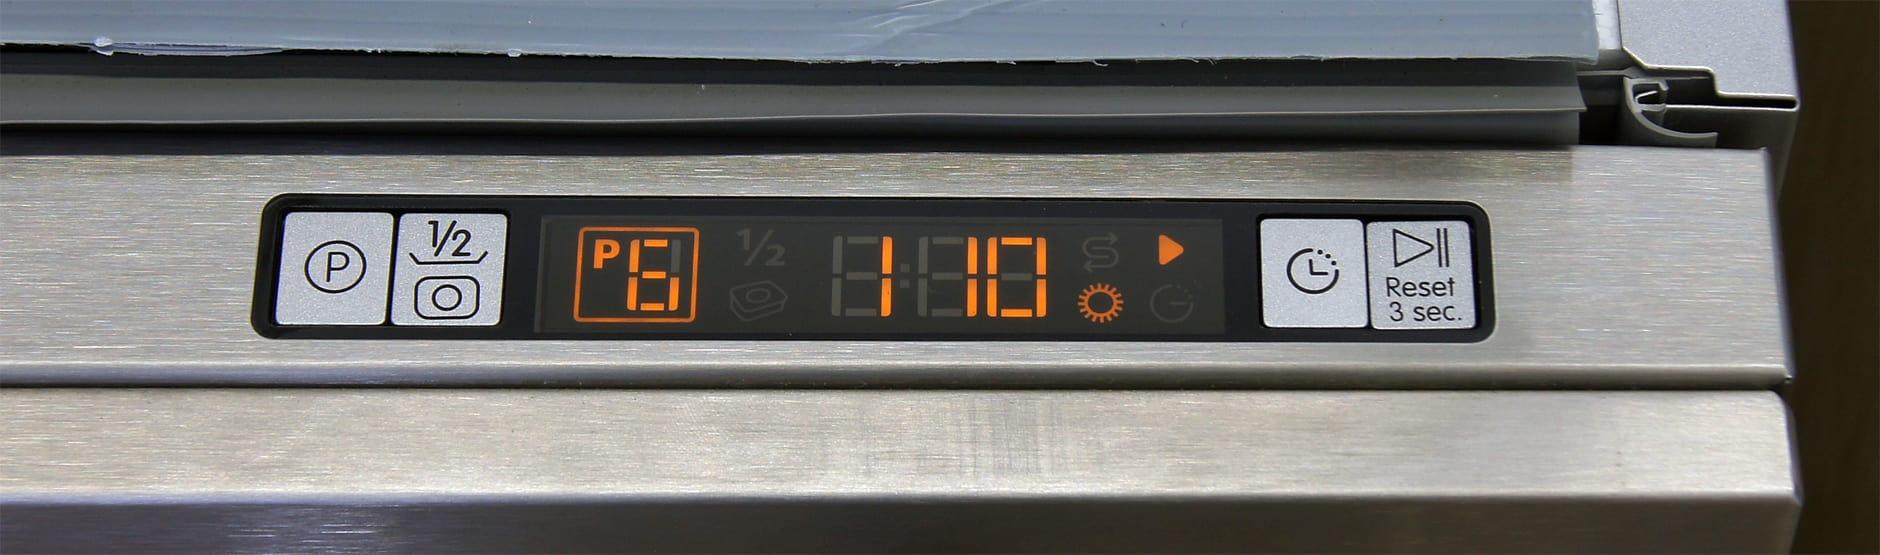 Blomberg DWT57500SS control display